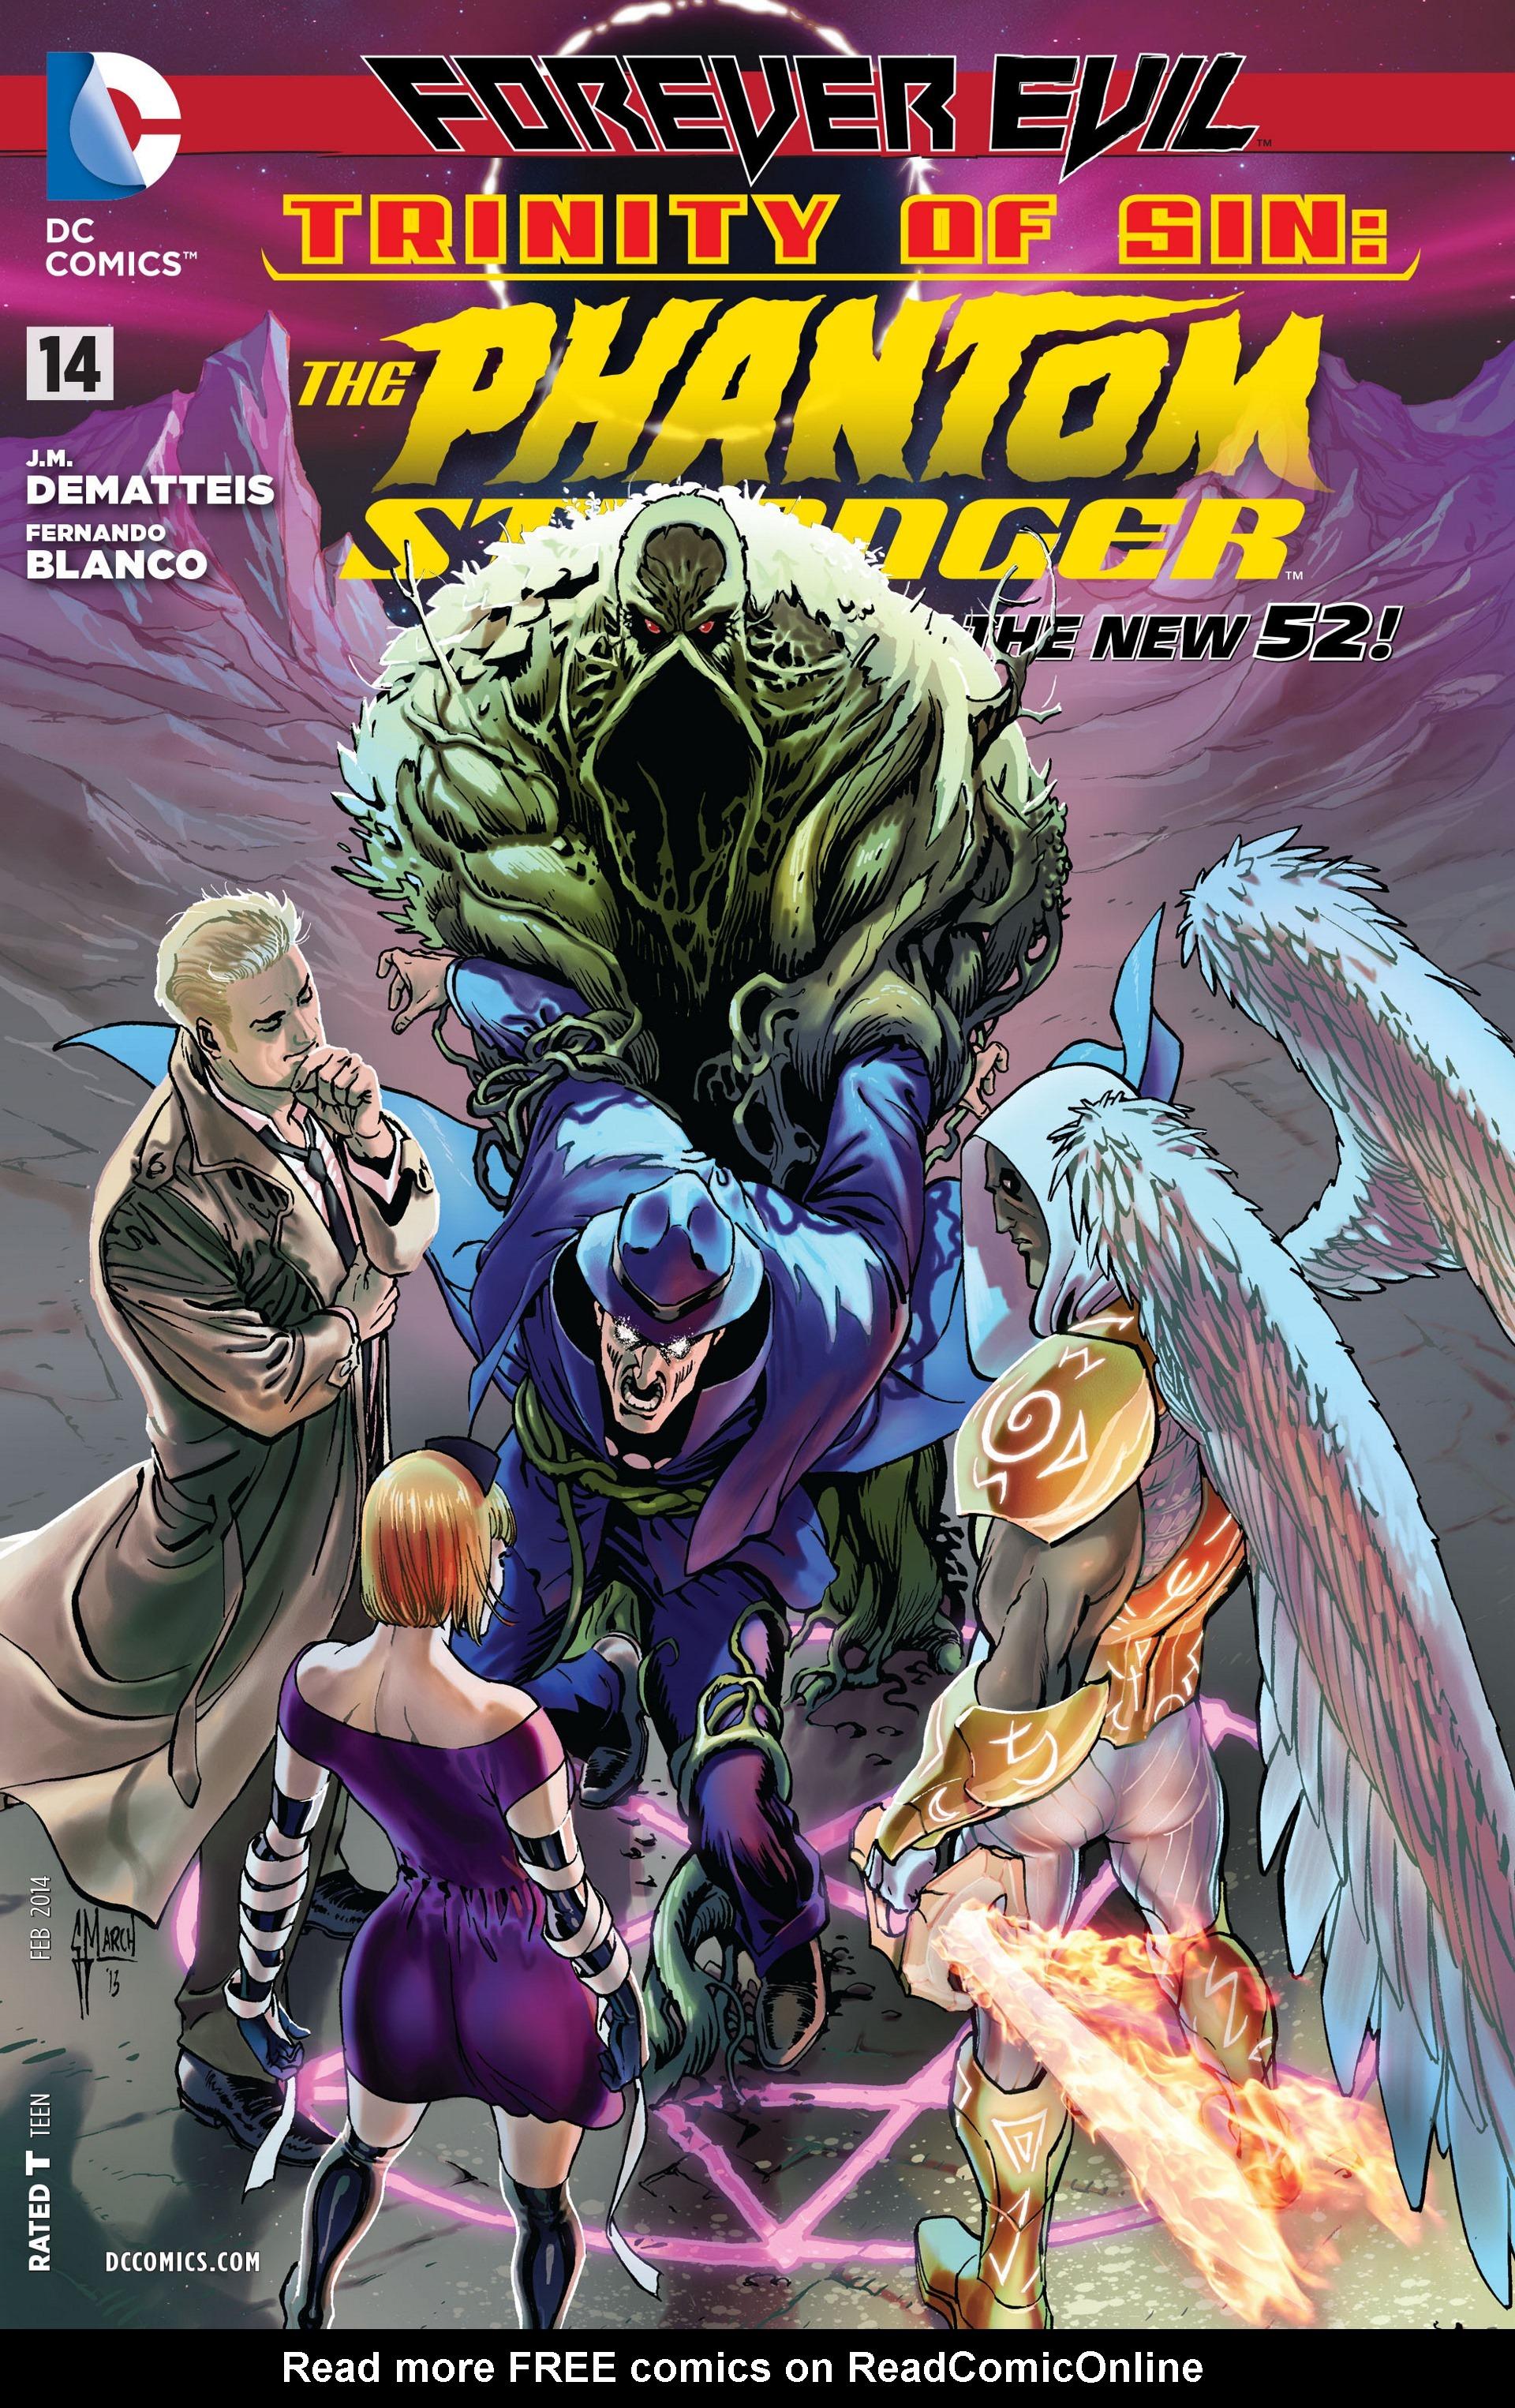 Read online Trinity of Sin: The Phantom Stranger comic -  Issue #14 - 1